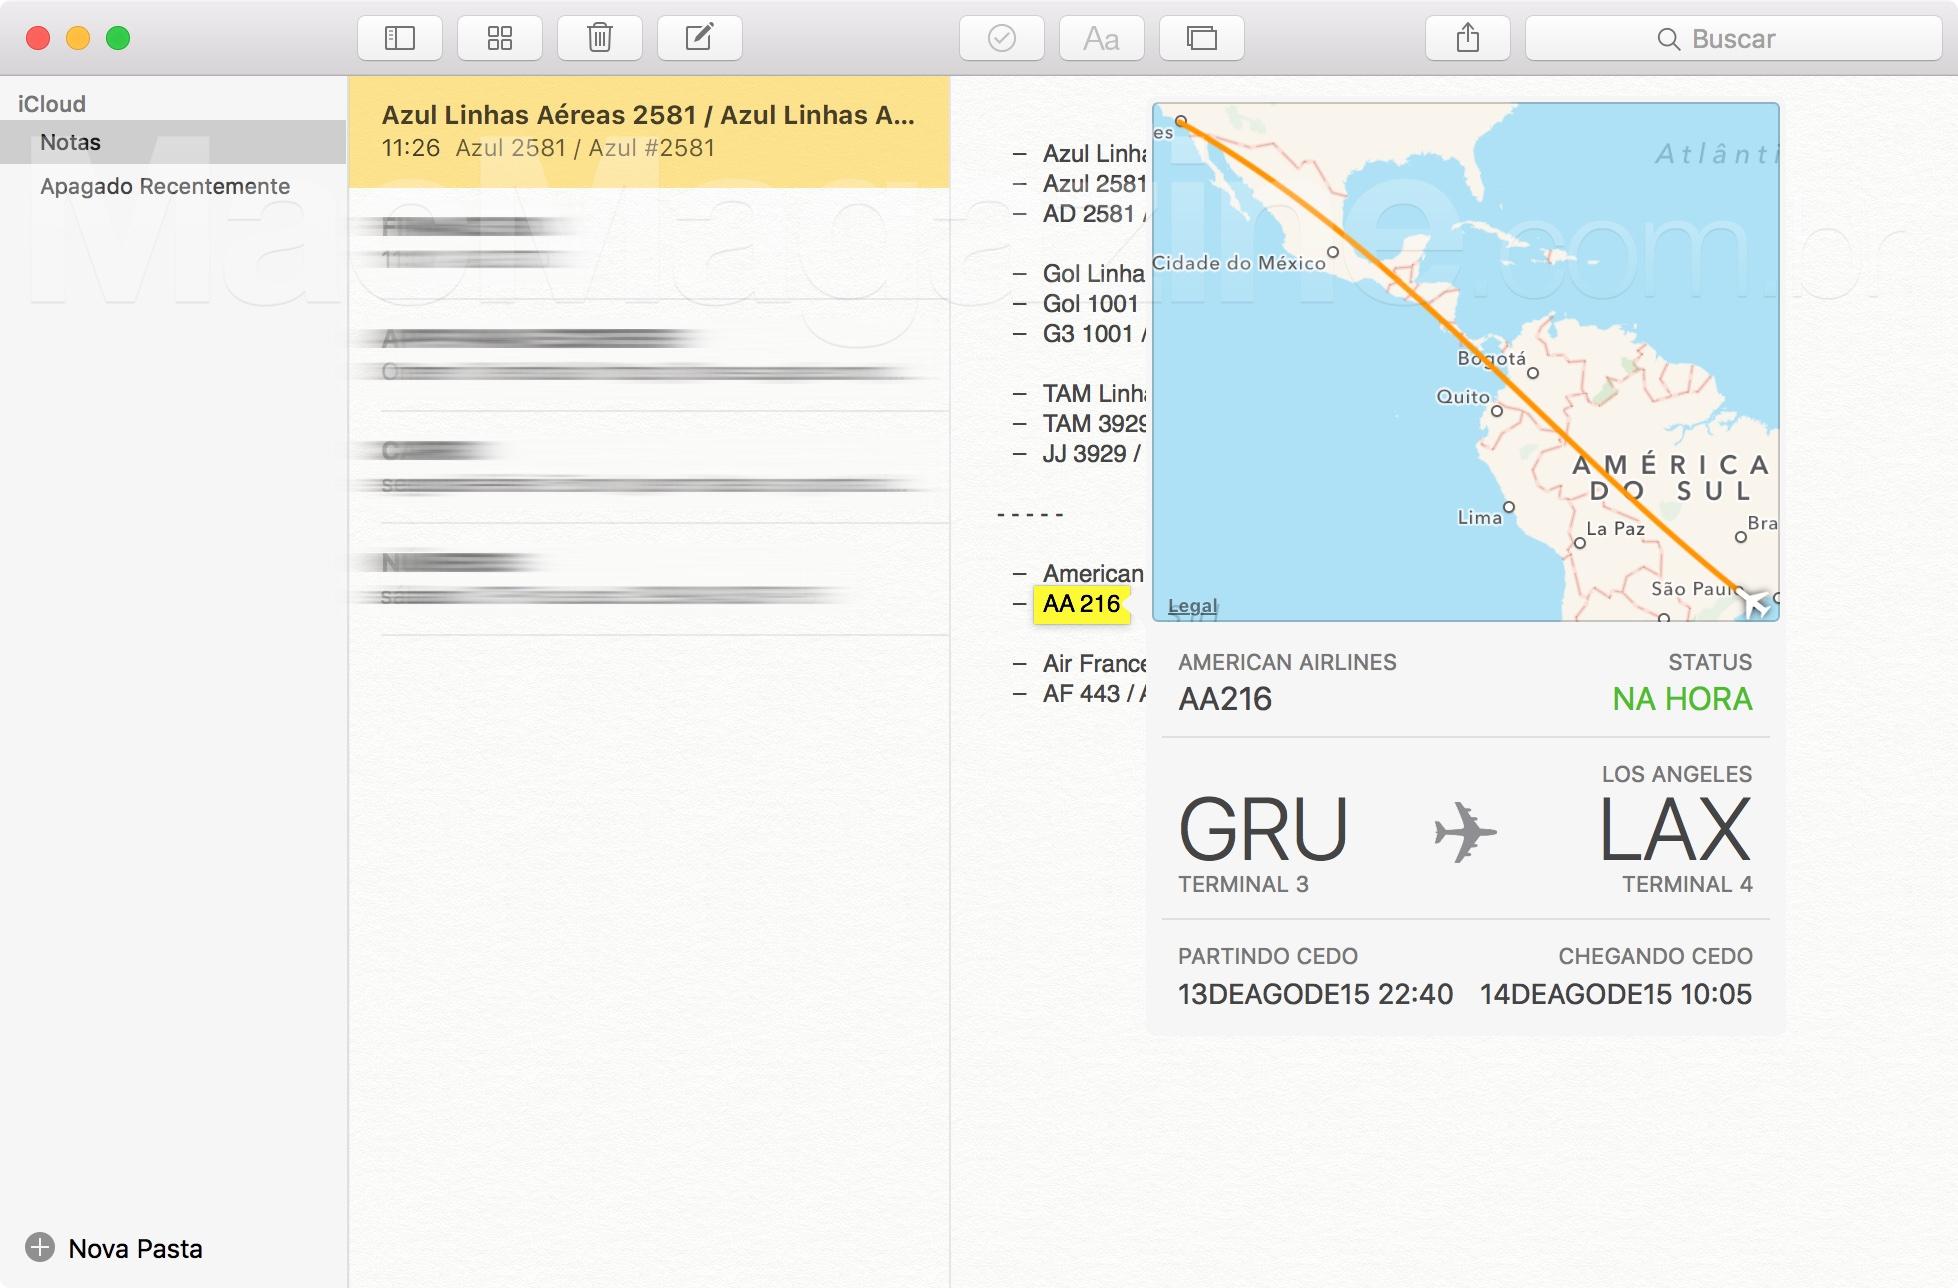 Informações de voos no OS X El Capitan 10.11